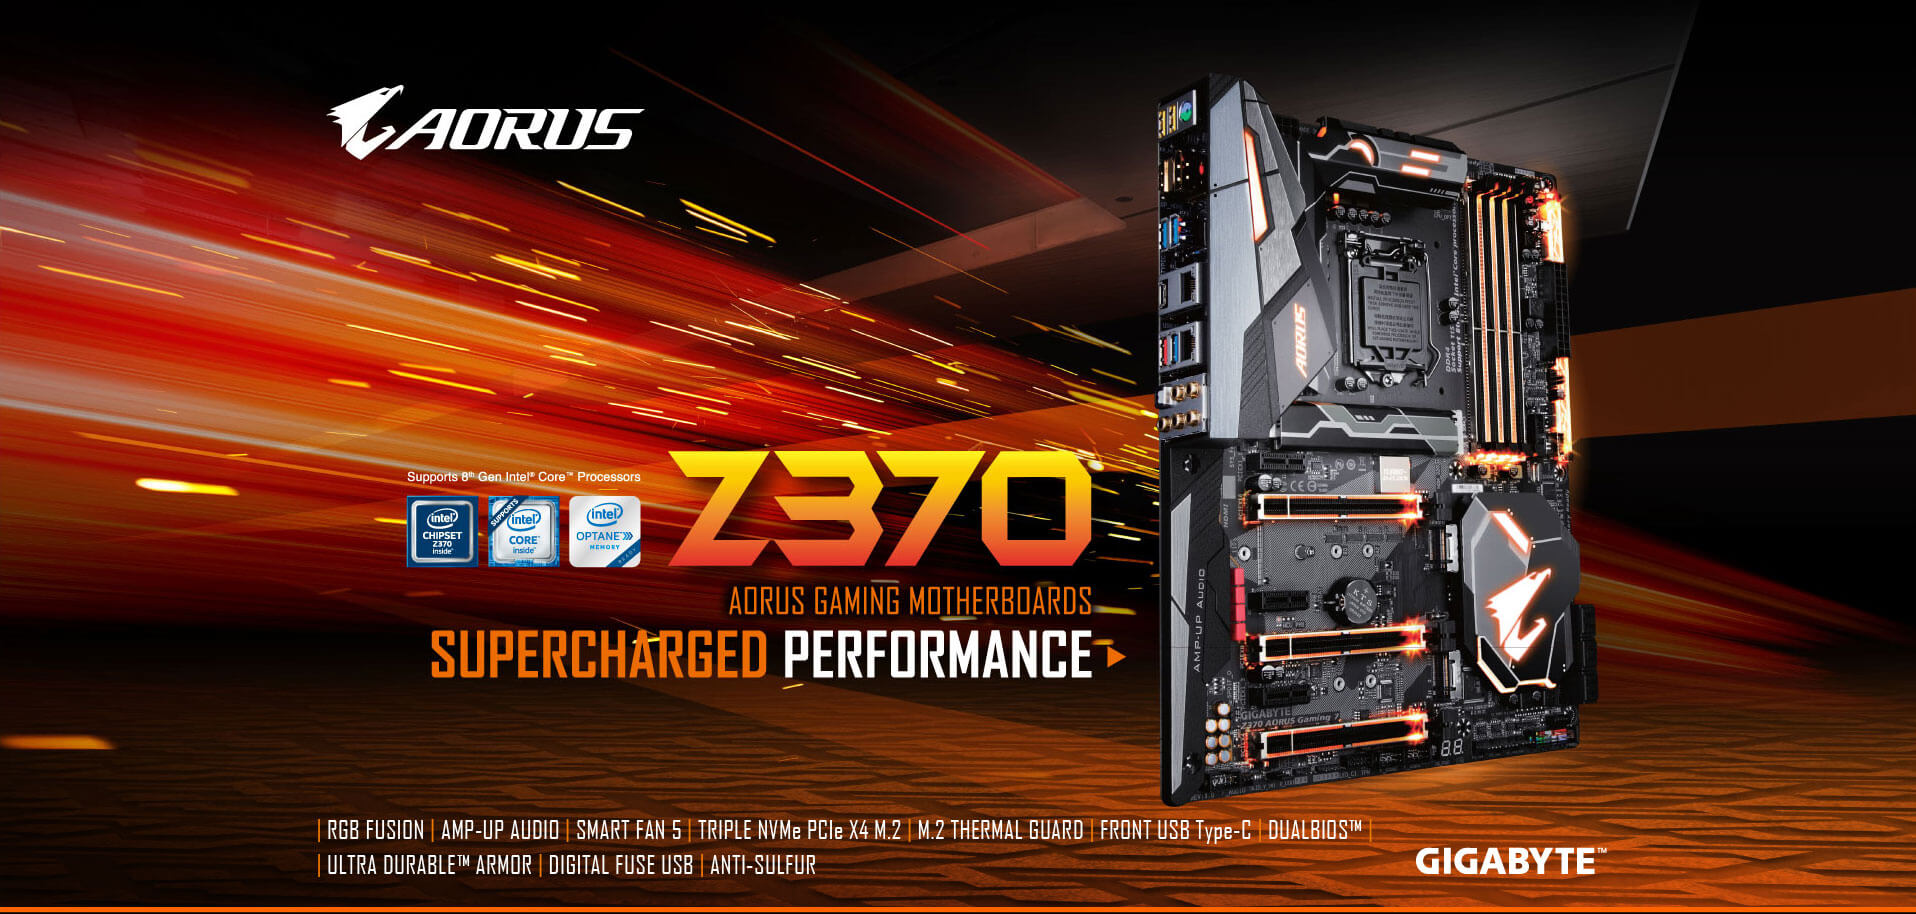 Z370 Aorus Gaming 7 Rev 10 Motherboard Gigabyte Global Peak Electronic Design Limited Ethernet Wiring Diagrams Patch 1